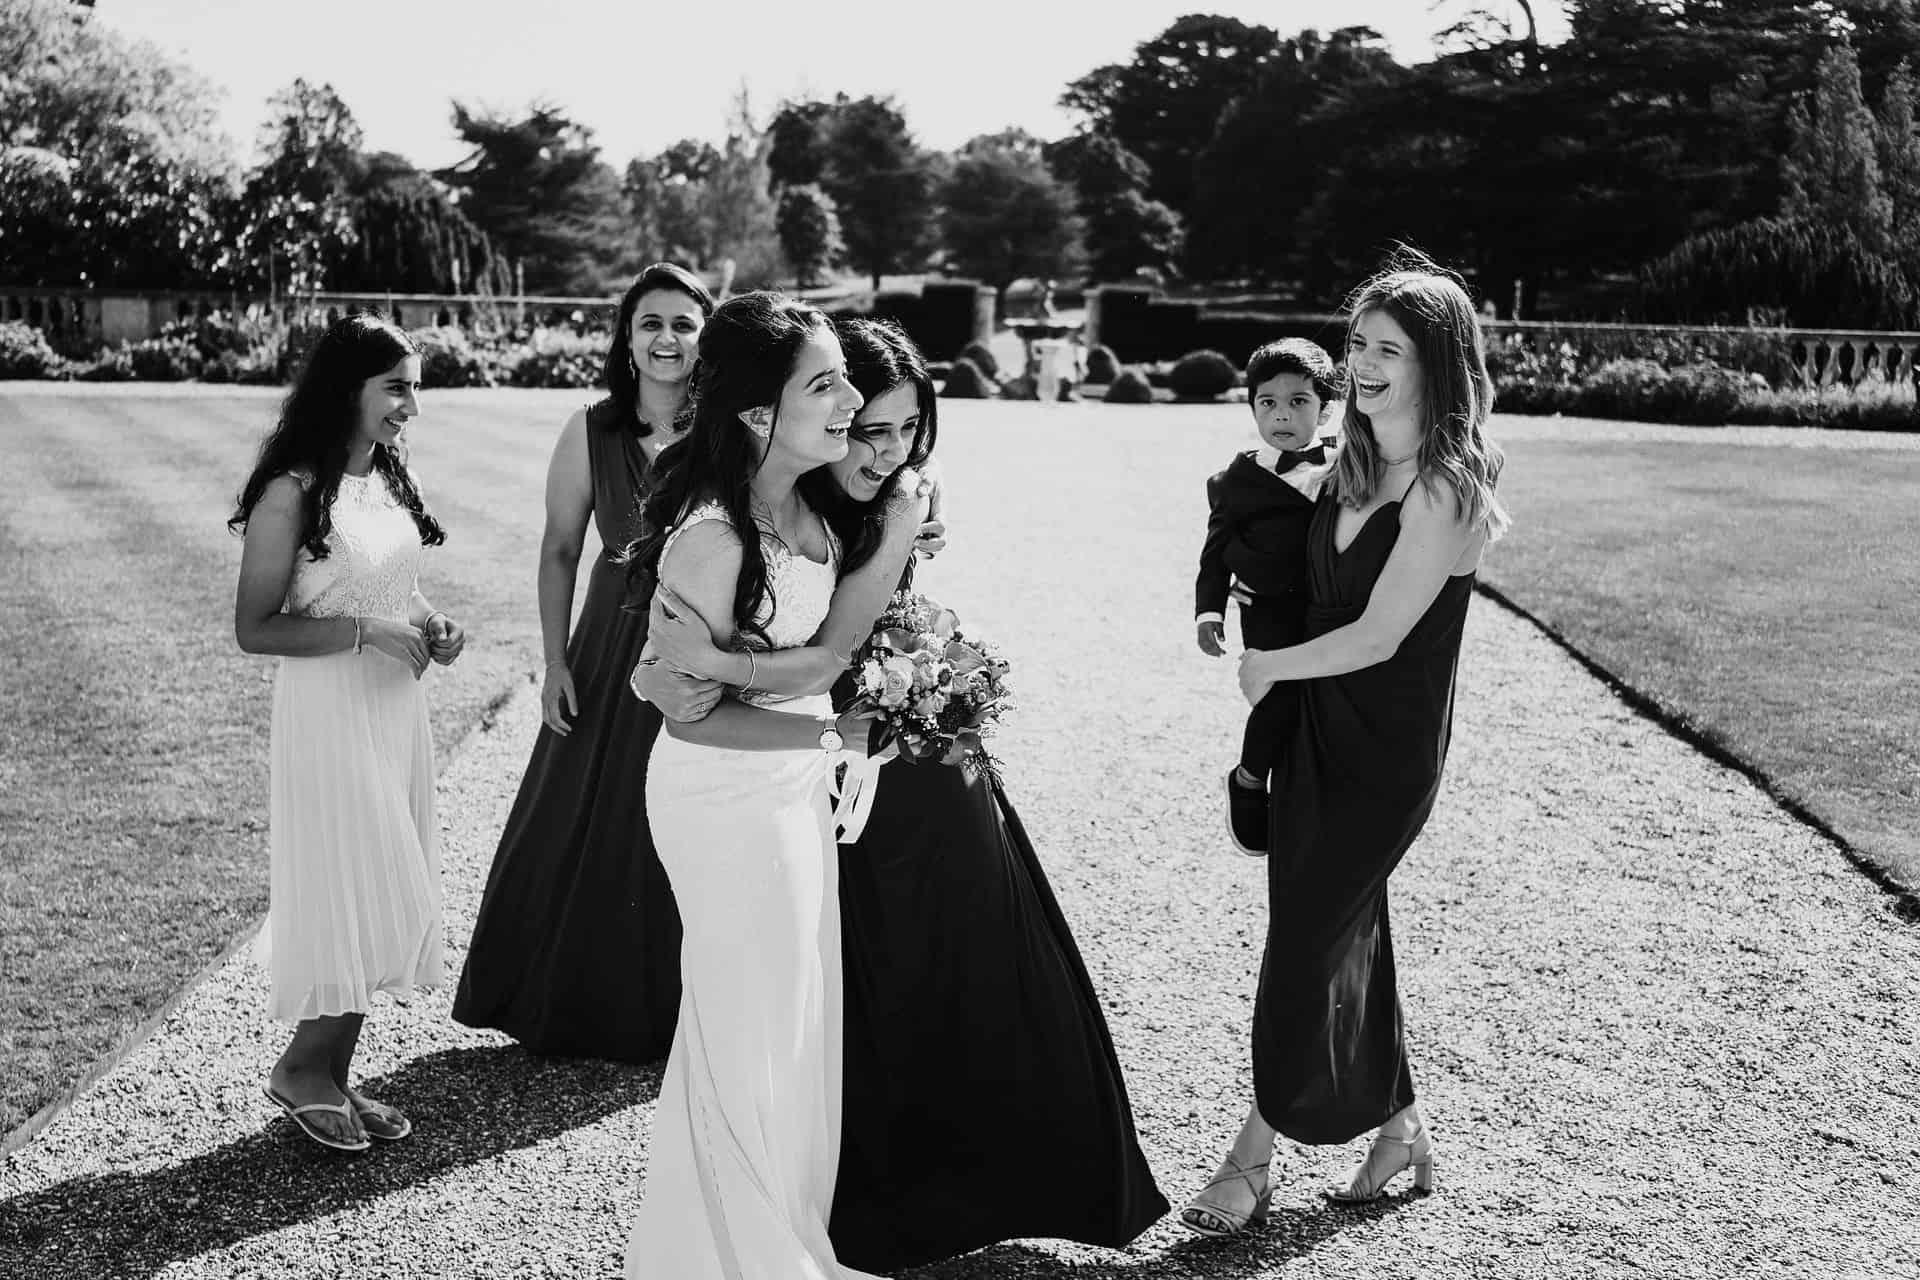 luton hoo summer wedding photographer bedfordshire